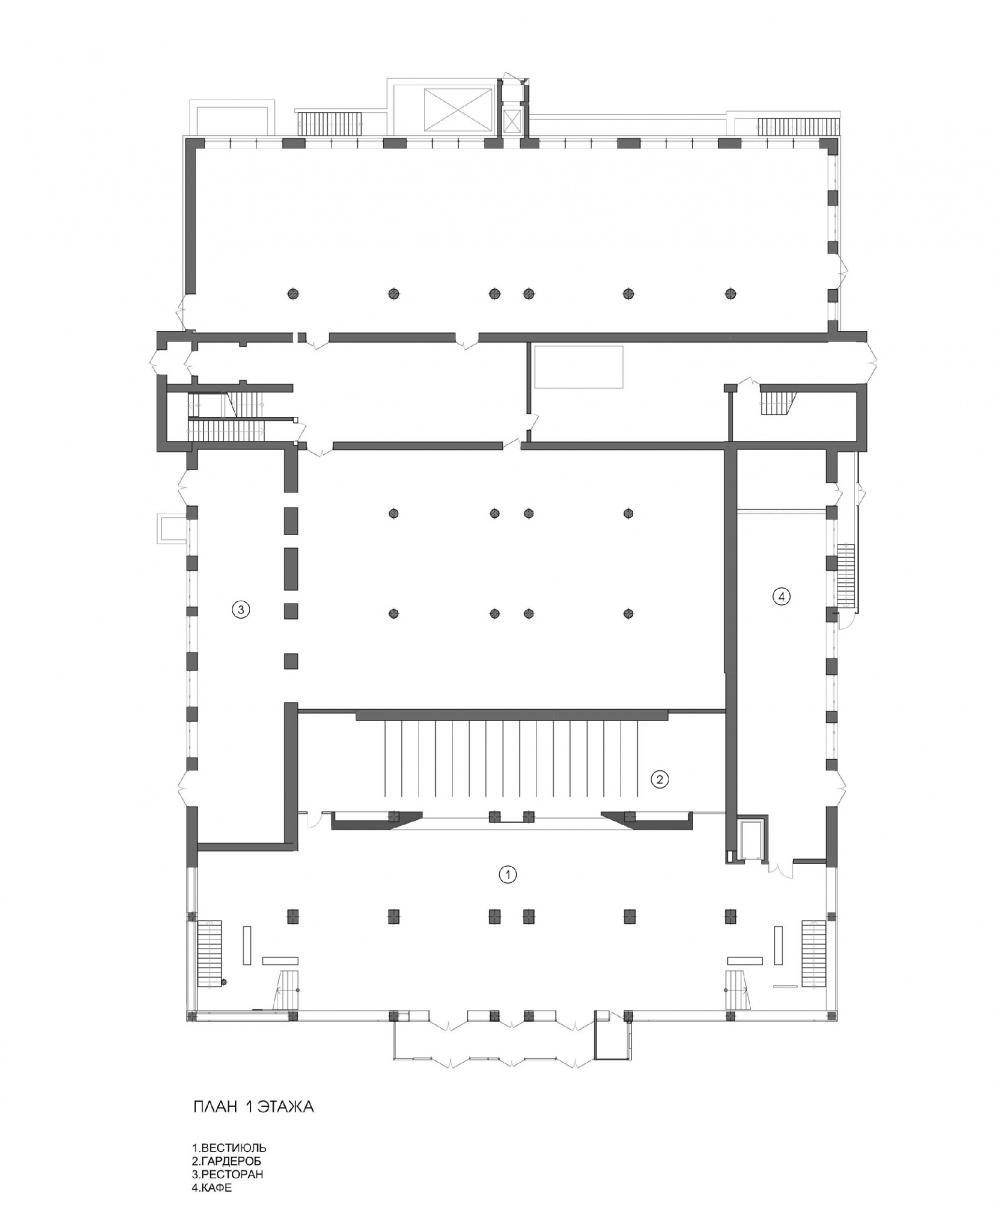 Концертный зал «Юпитер». План 1 этажа<br>© Архитектурное бюро С. Горшунова